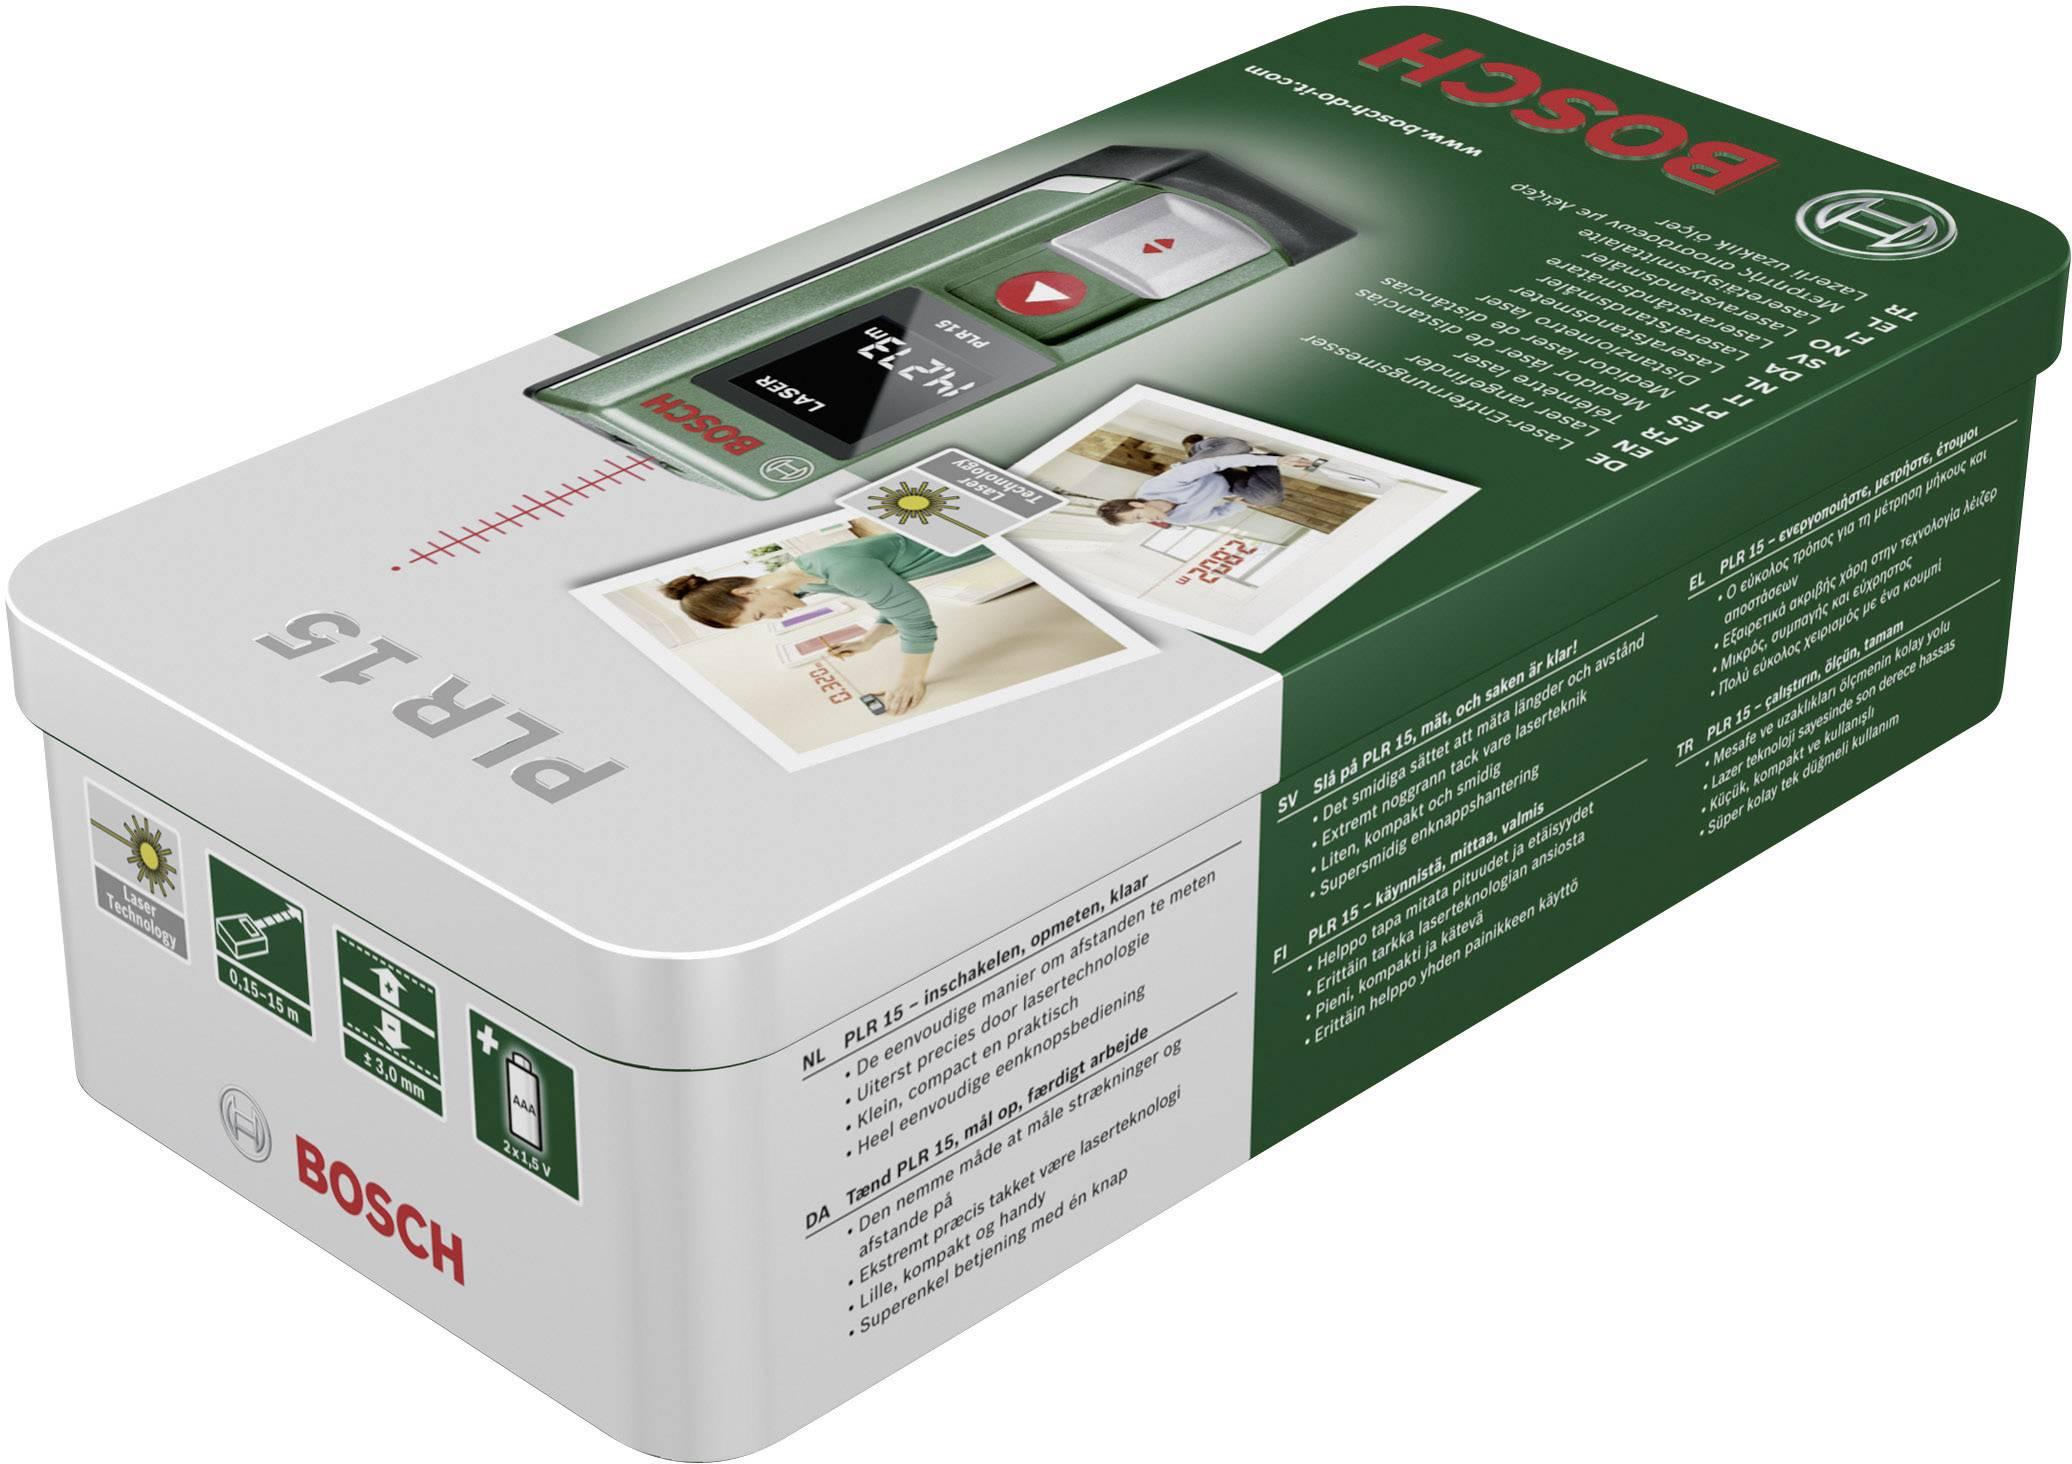 Laser Entfernungsmesser Werbeartikel : Laser entfernungsmesser werbeartikel kreative und